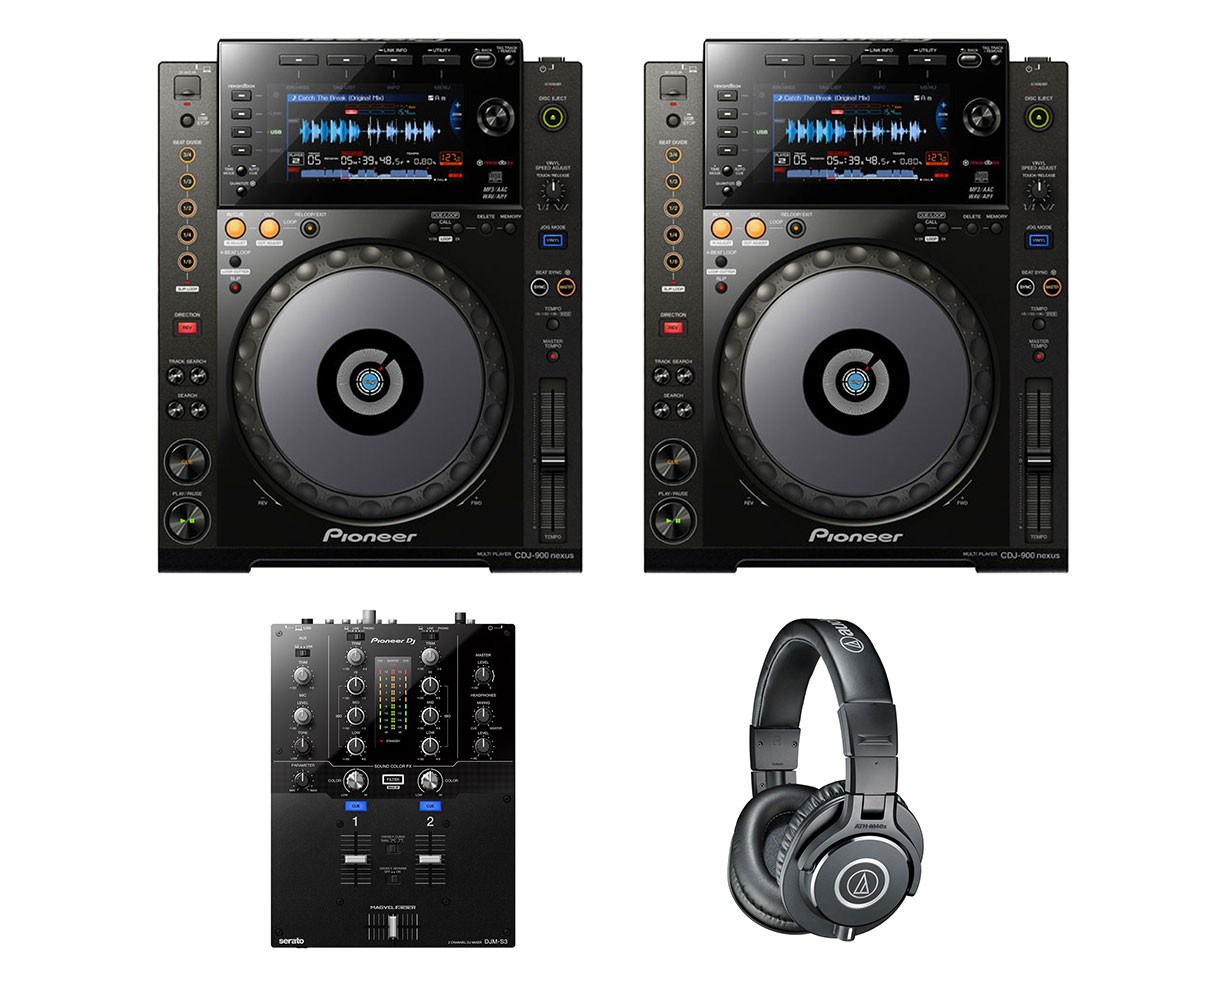 2x Pioneer CDJ-900 Nexus + DJM-S3 + ATH-M40X